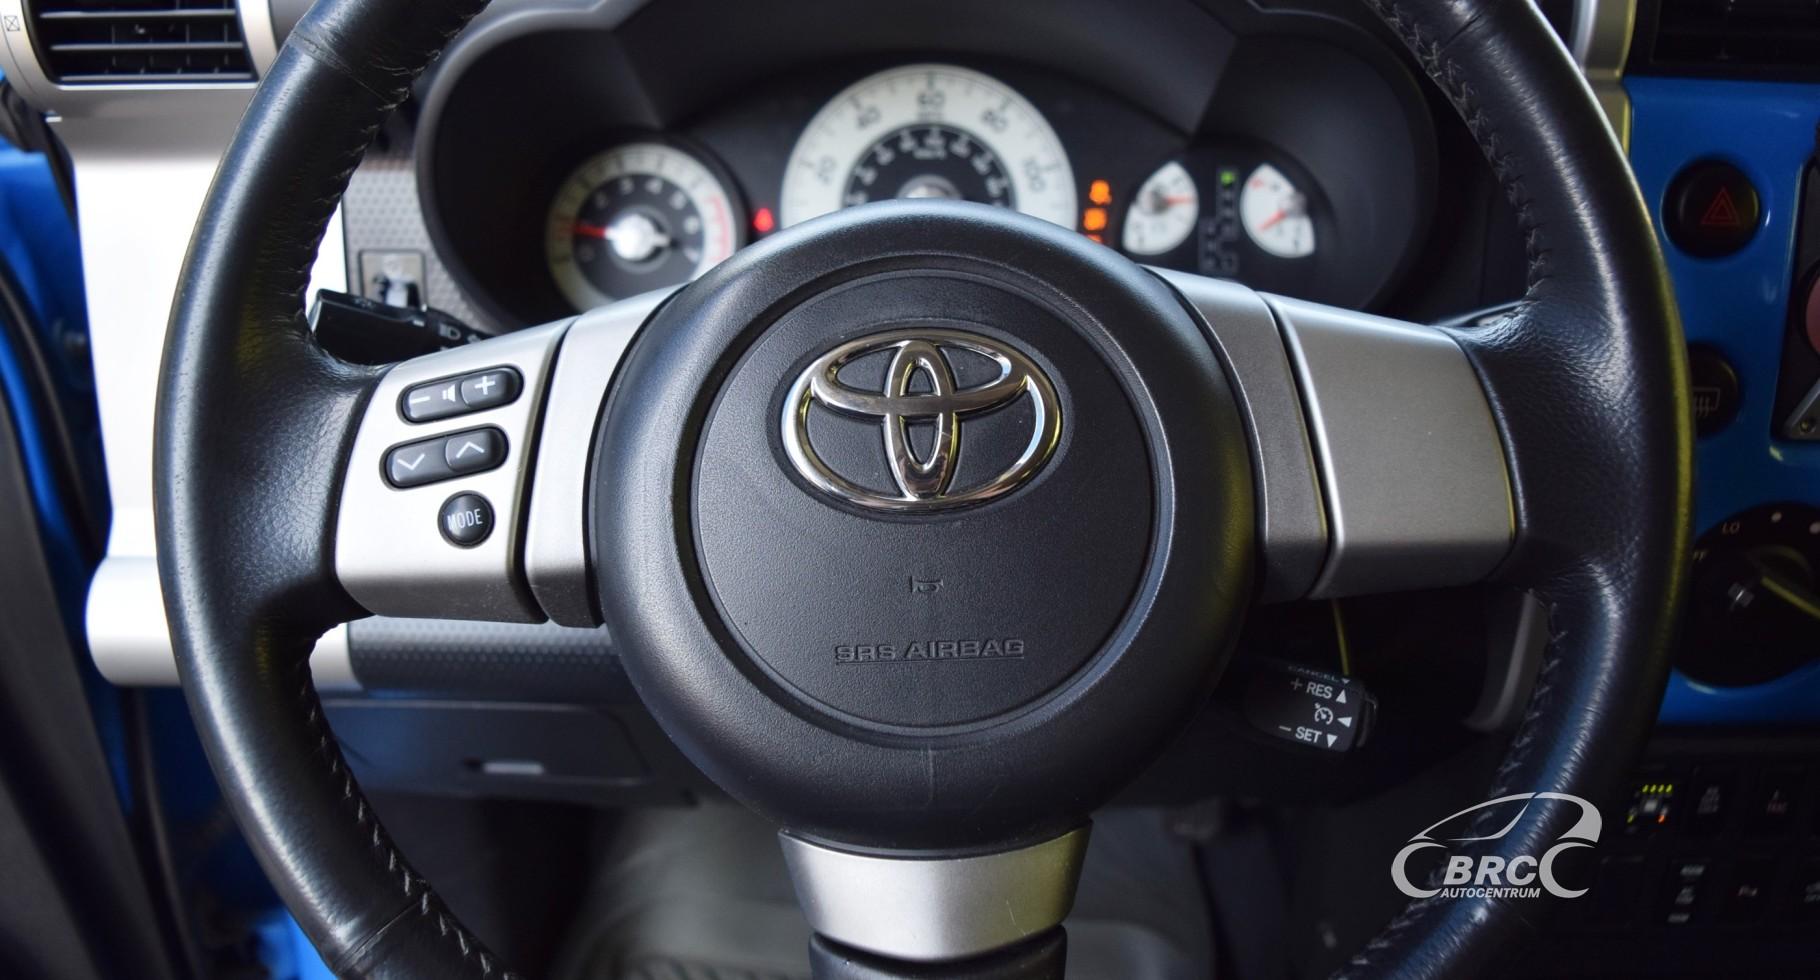 Toyota FJ Cruiser AT